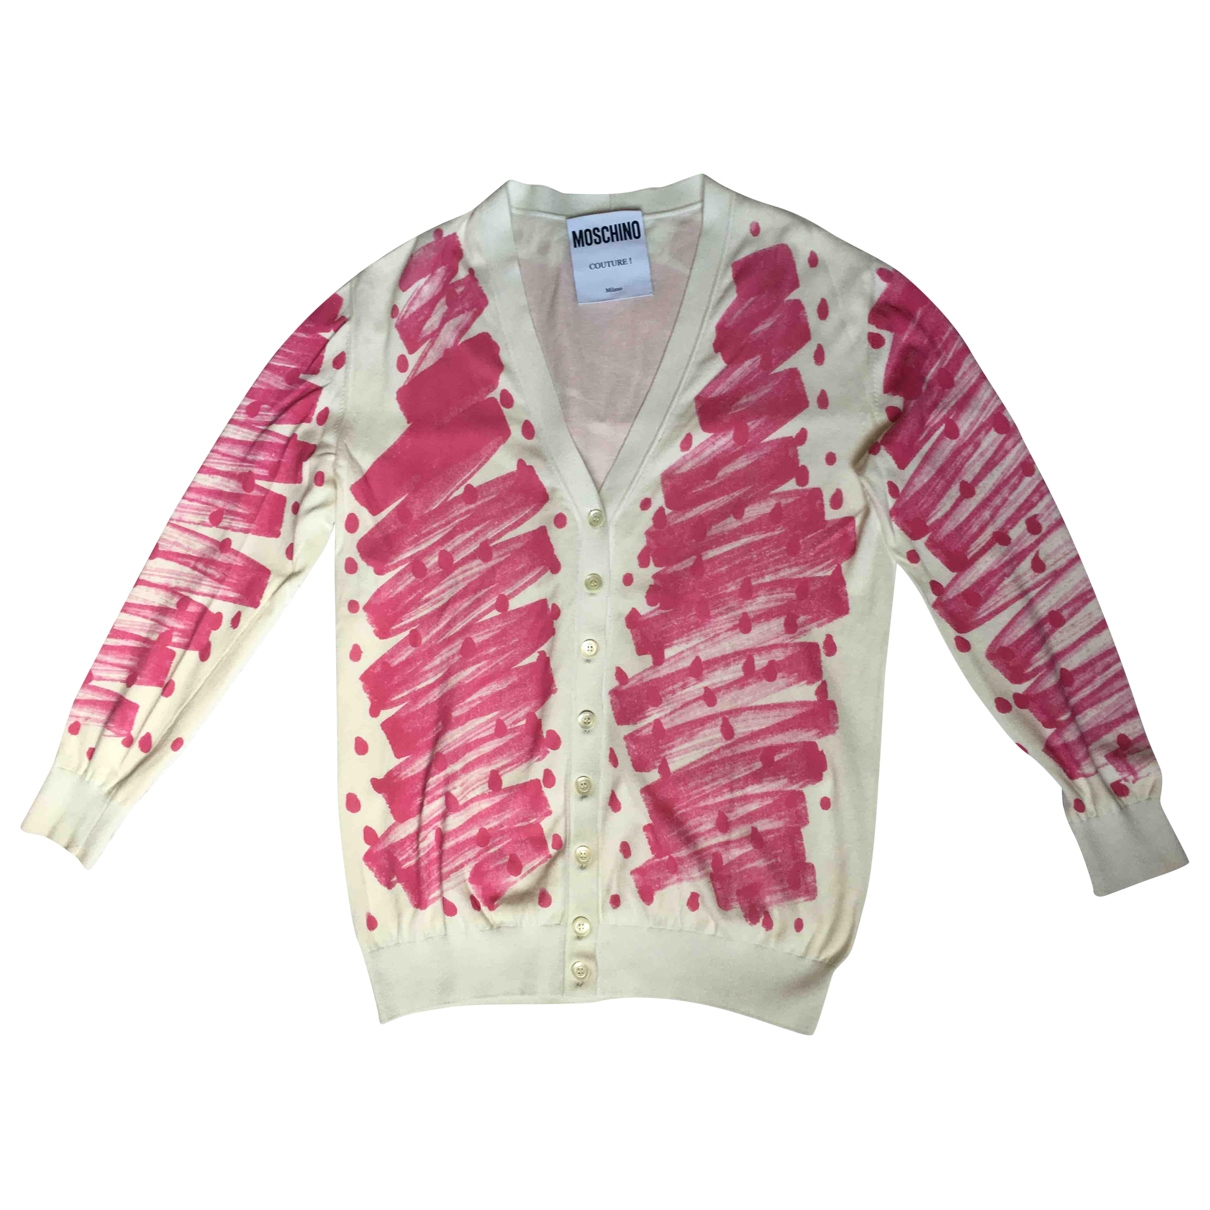 Moschino - Pull   pour femme en coton - rose